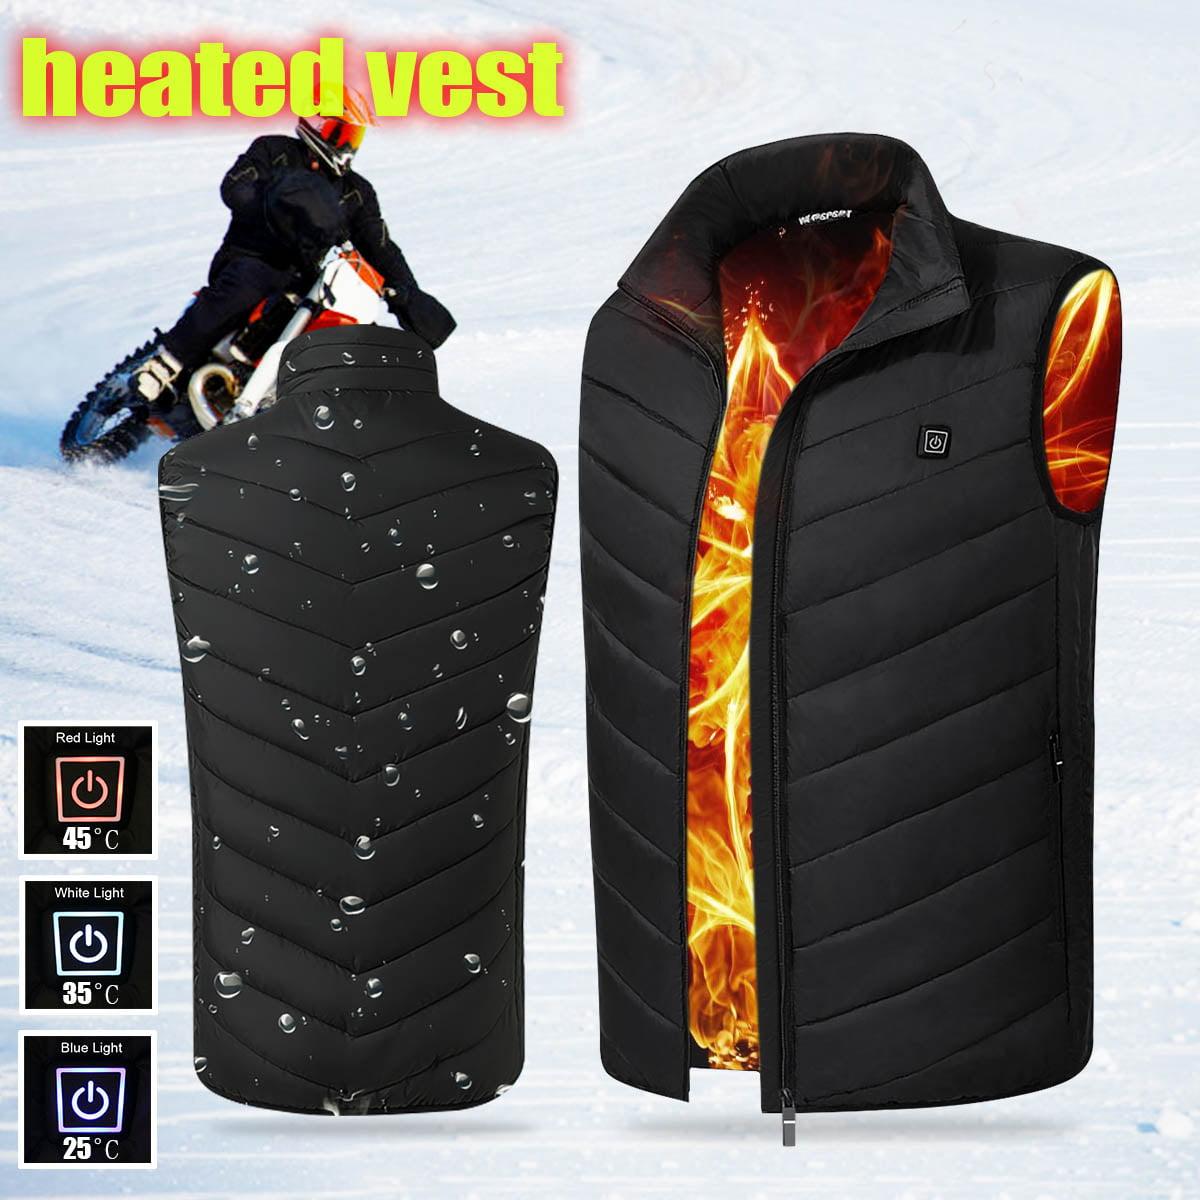 Mens Intelligent Heating USB Sleeveless Vest Winter Heated Jacket Outerwear Workwear Motorcycle Warm Warmer Full Zipper Coats Breathable Wind Resistant Coat Three Modes Washable